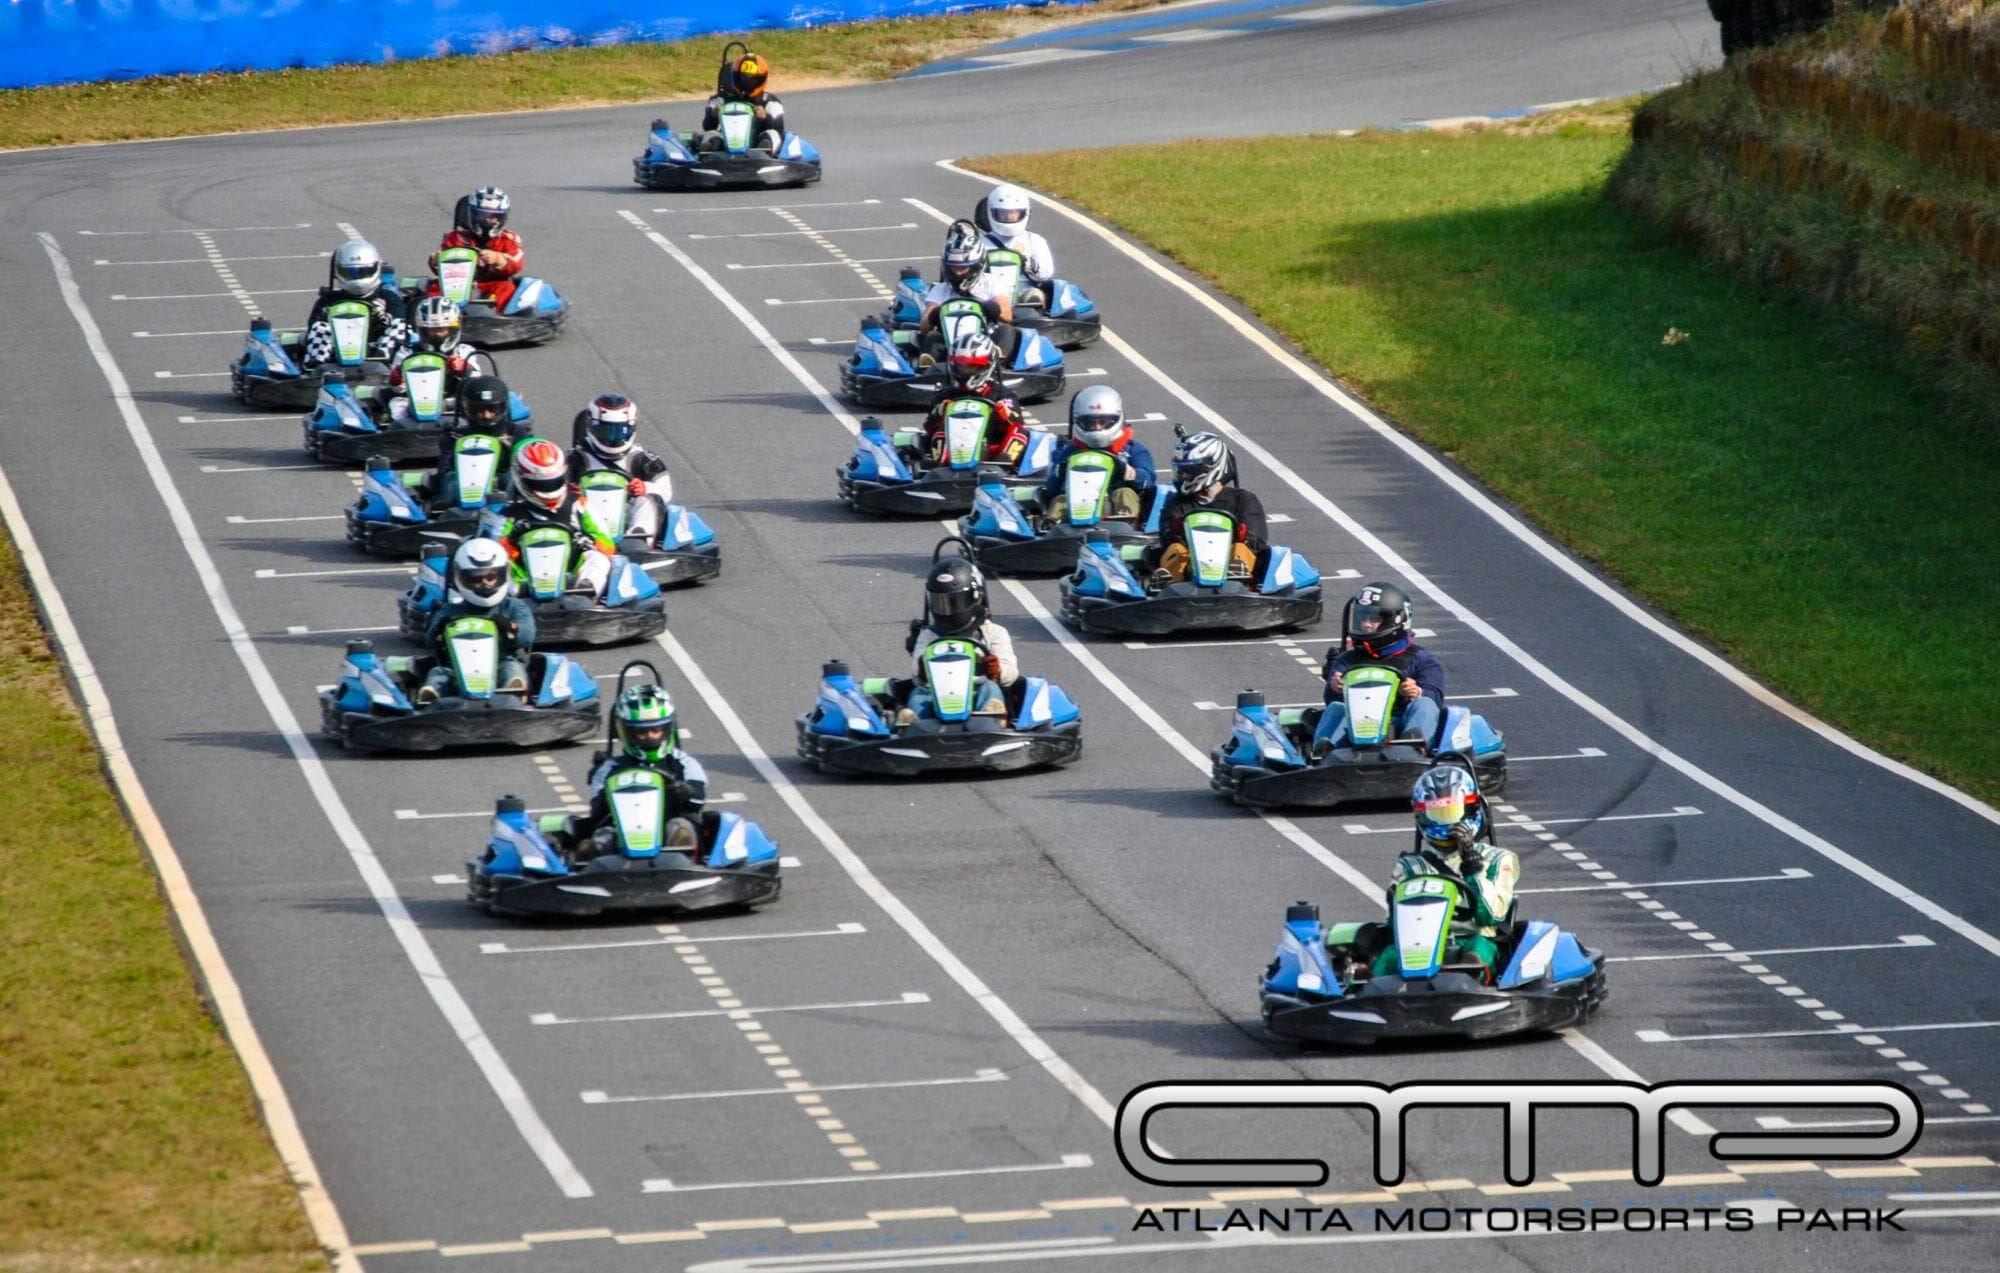 atlanta kart League Nights are Back for 2016 | Atlanta Motorsports Park atlanta kart